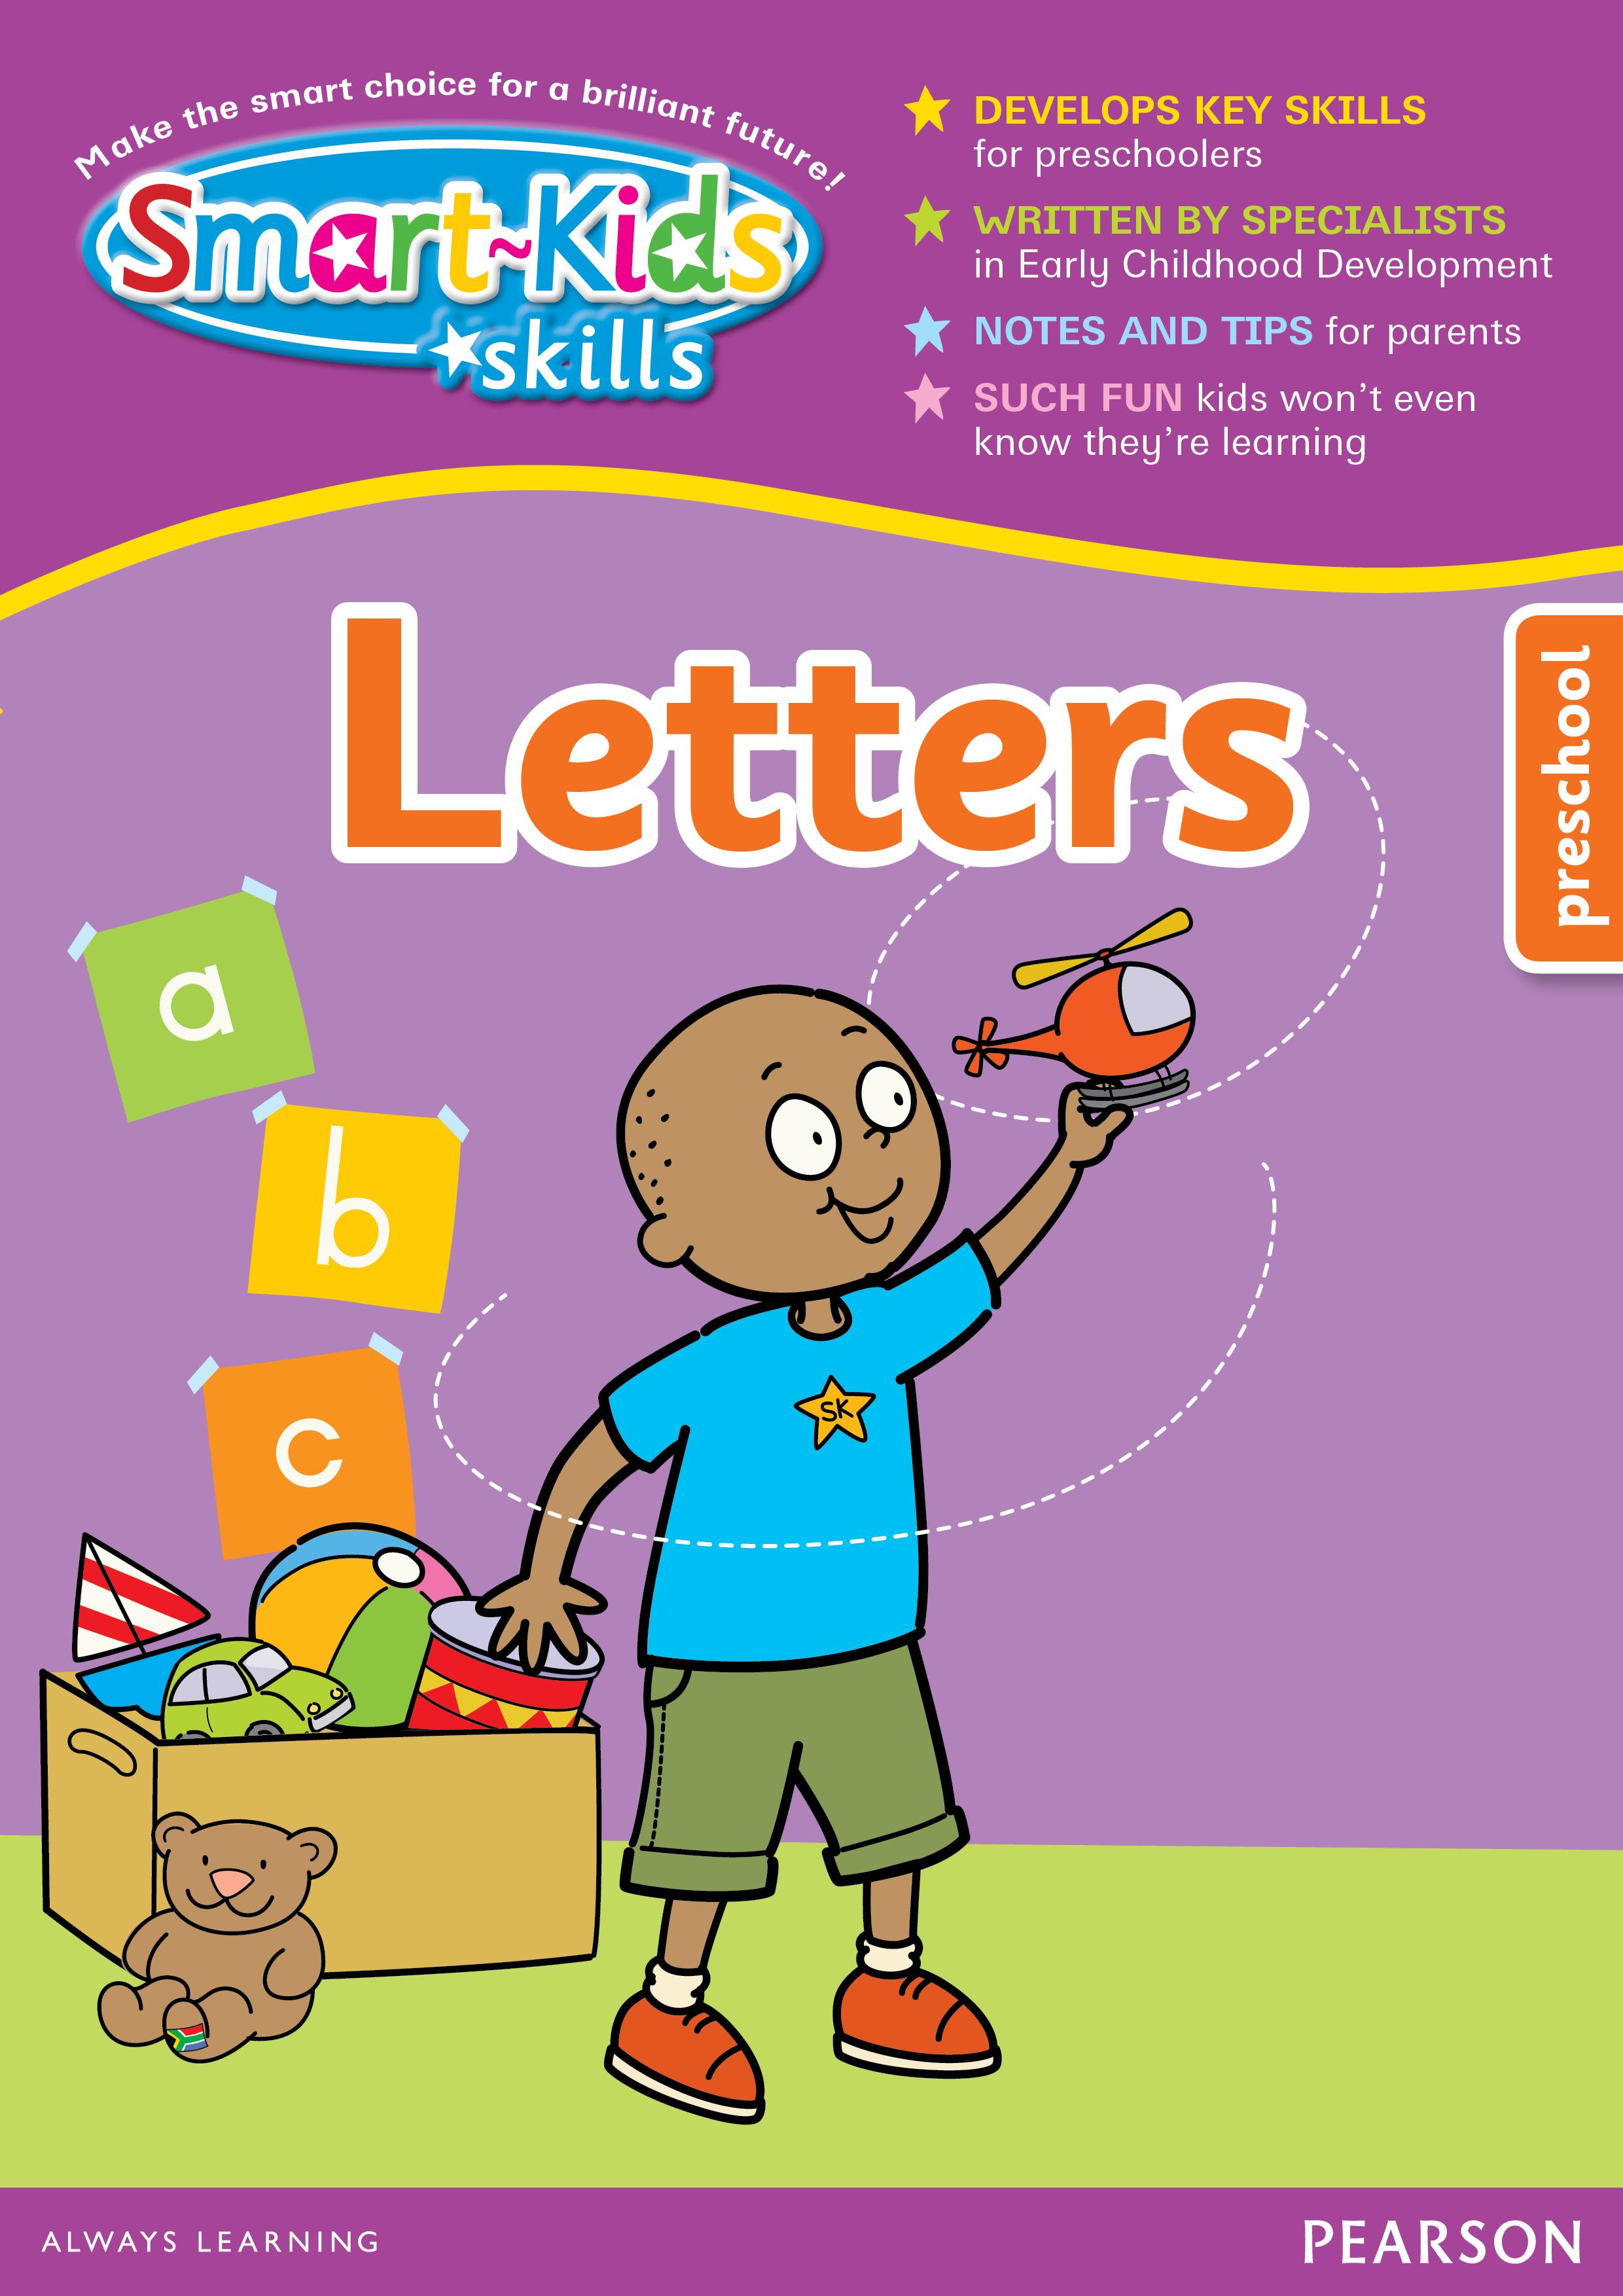 Smart-Kids Skills: Letters (Preschool): Preschool